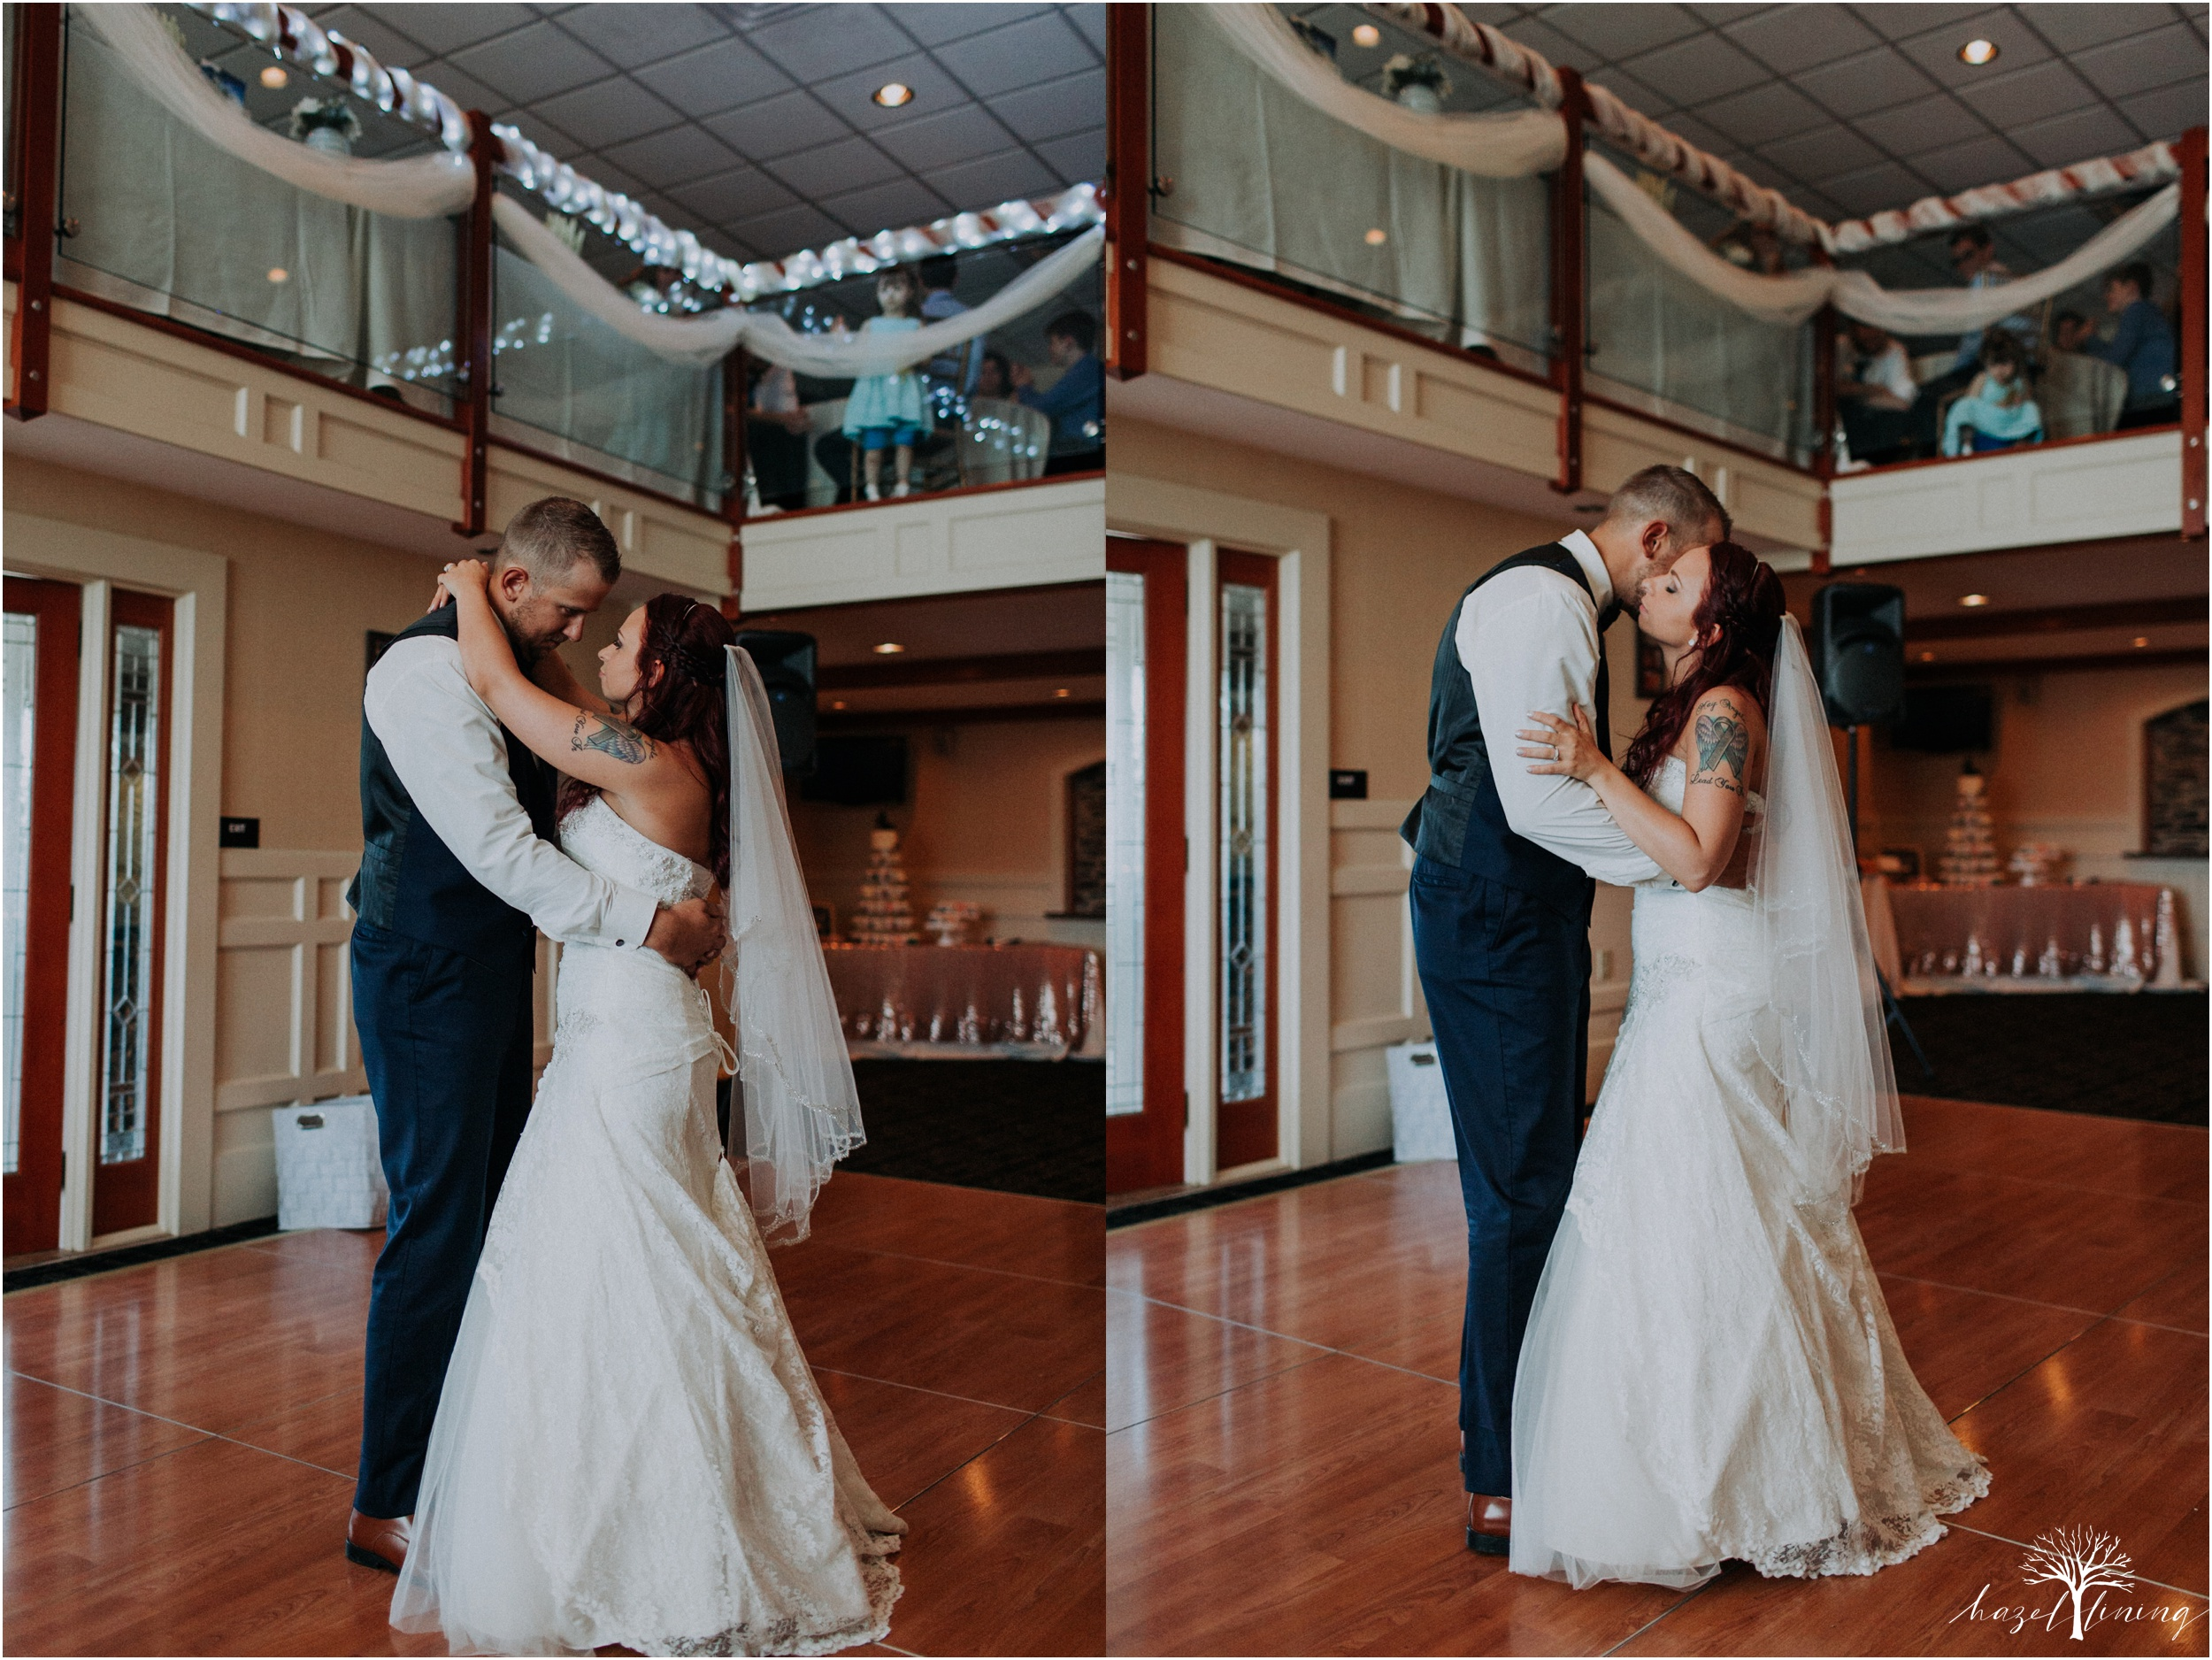 alyssa-james-stiteler-wedding-loft-and-sweet-water-cc-pennsburg-pennsylvania-hazel-lining-travel-wedding-elopement-photography_0124.jpg